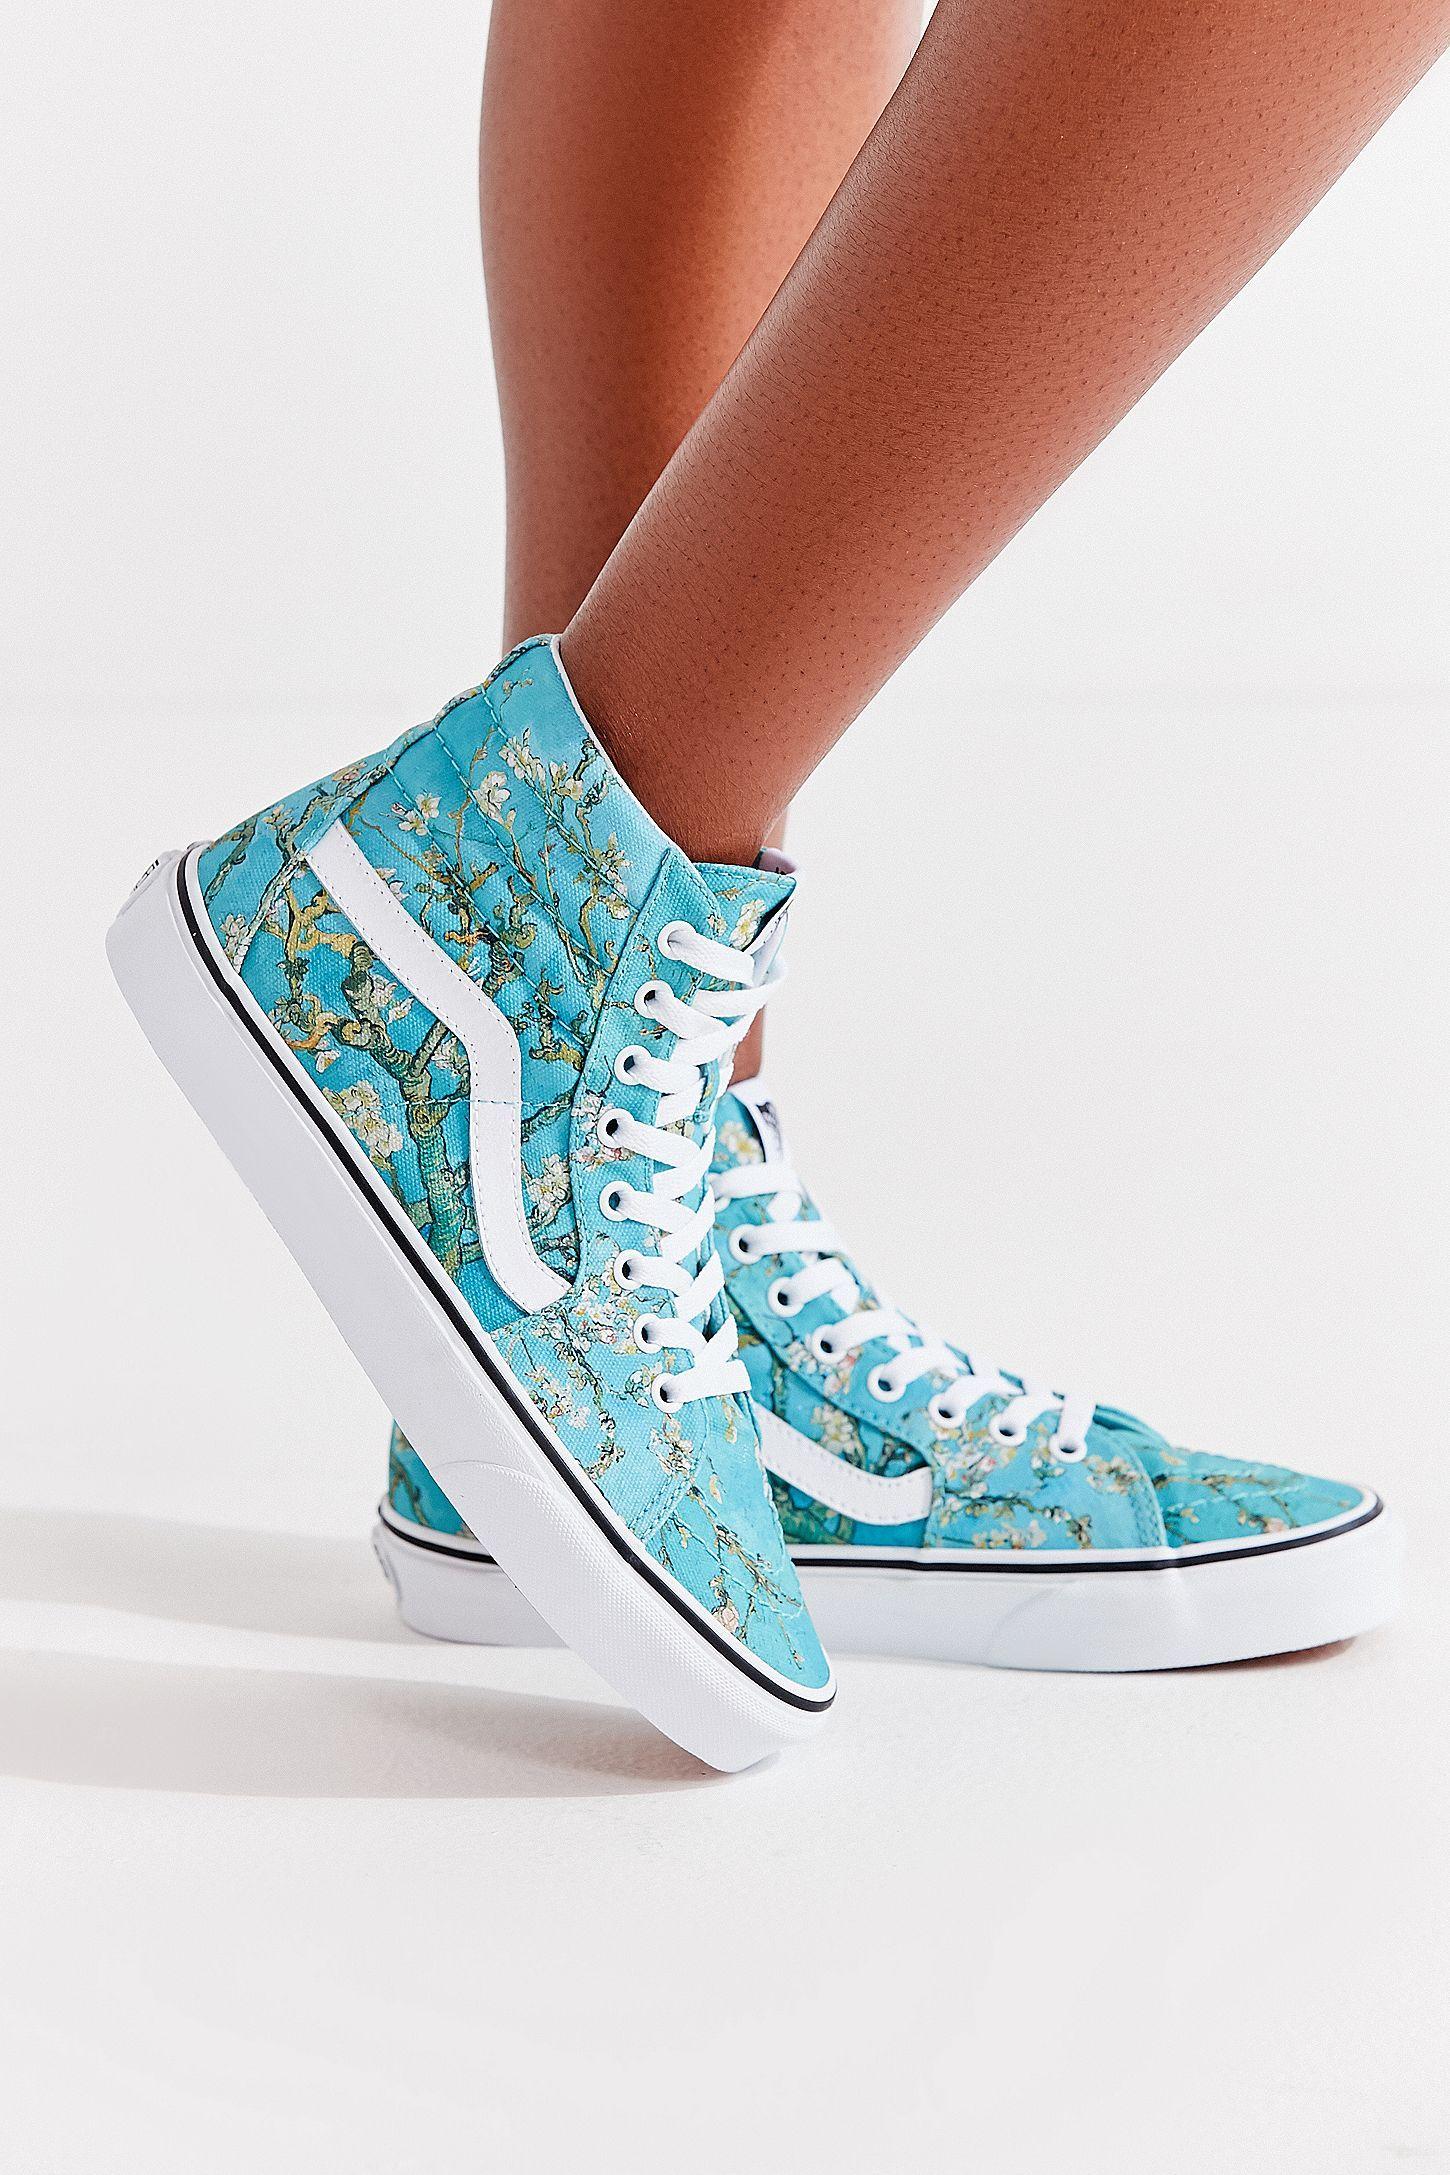 Vans X Van Gogh Sk8 Hi Sneaker Vans Shoes Women Shoes Sneakers